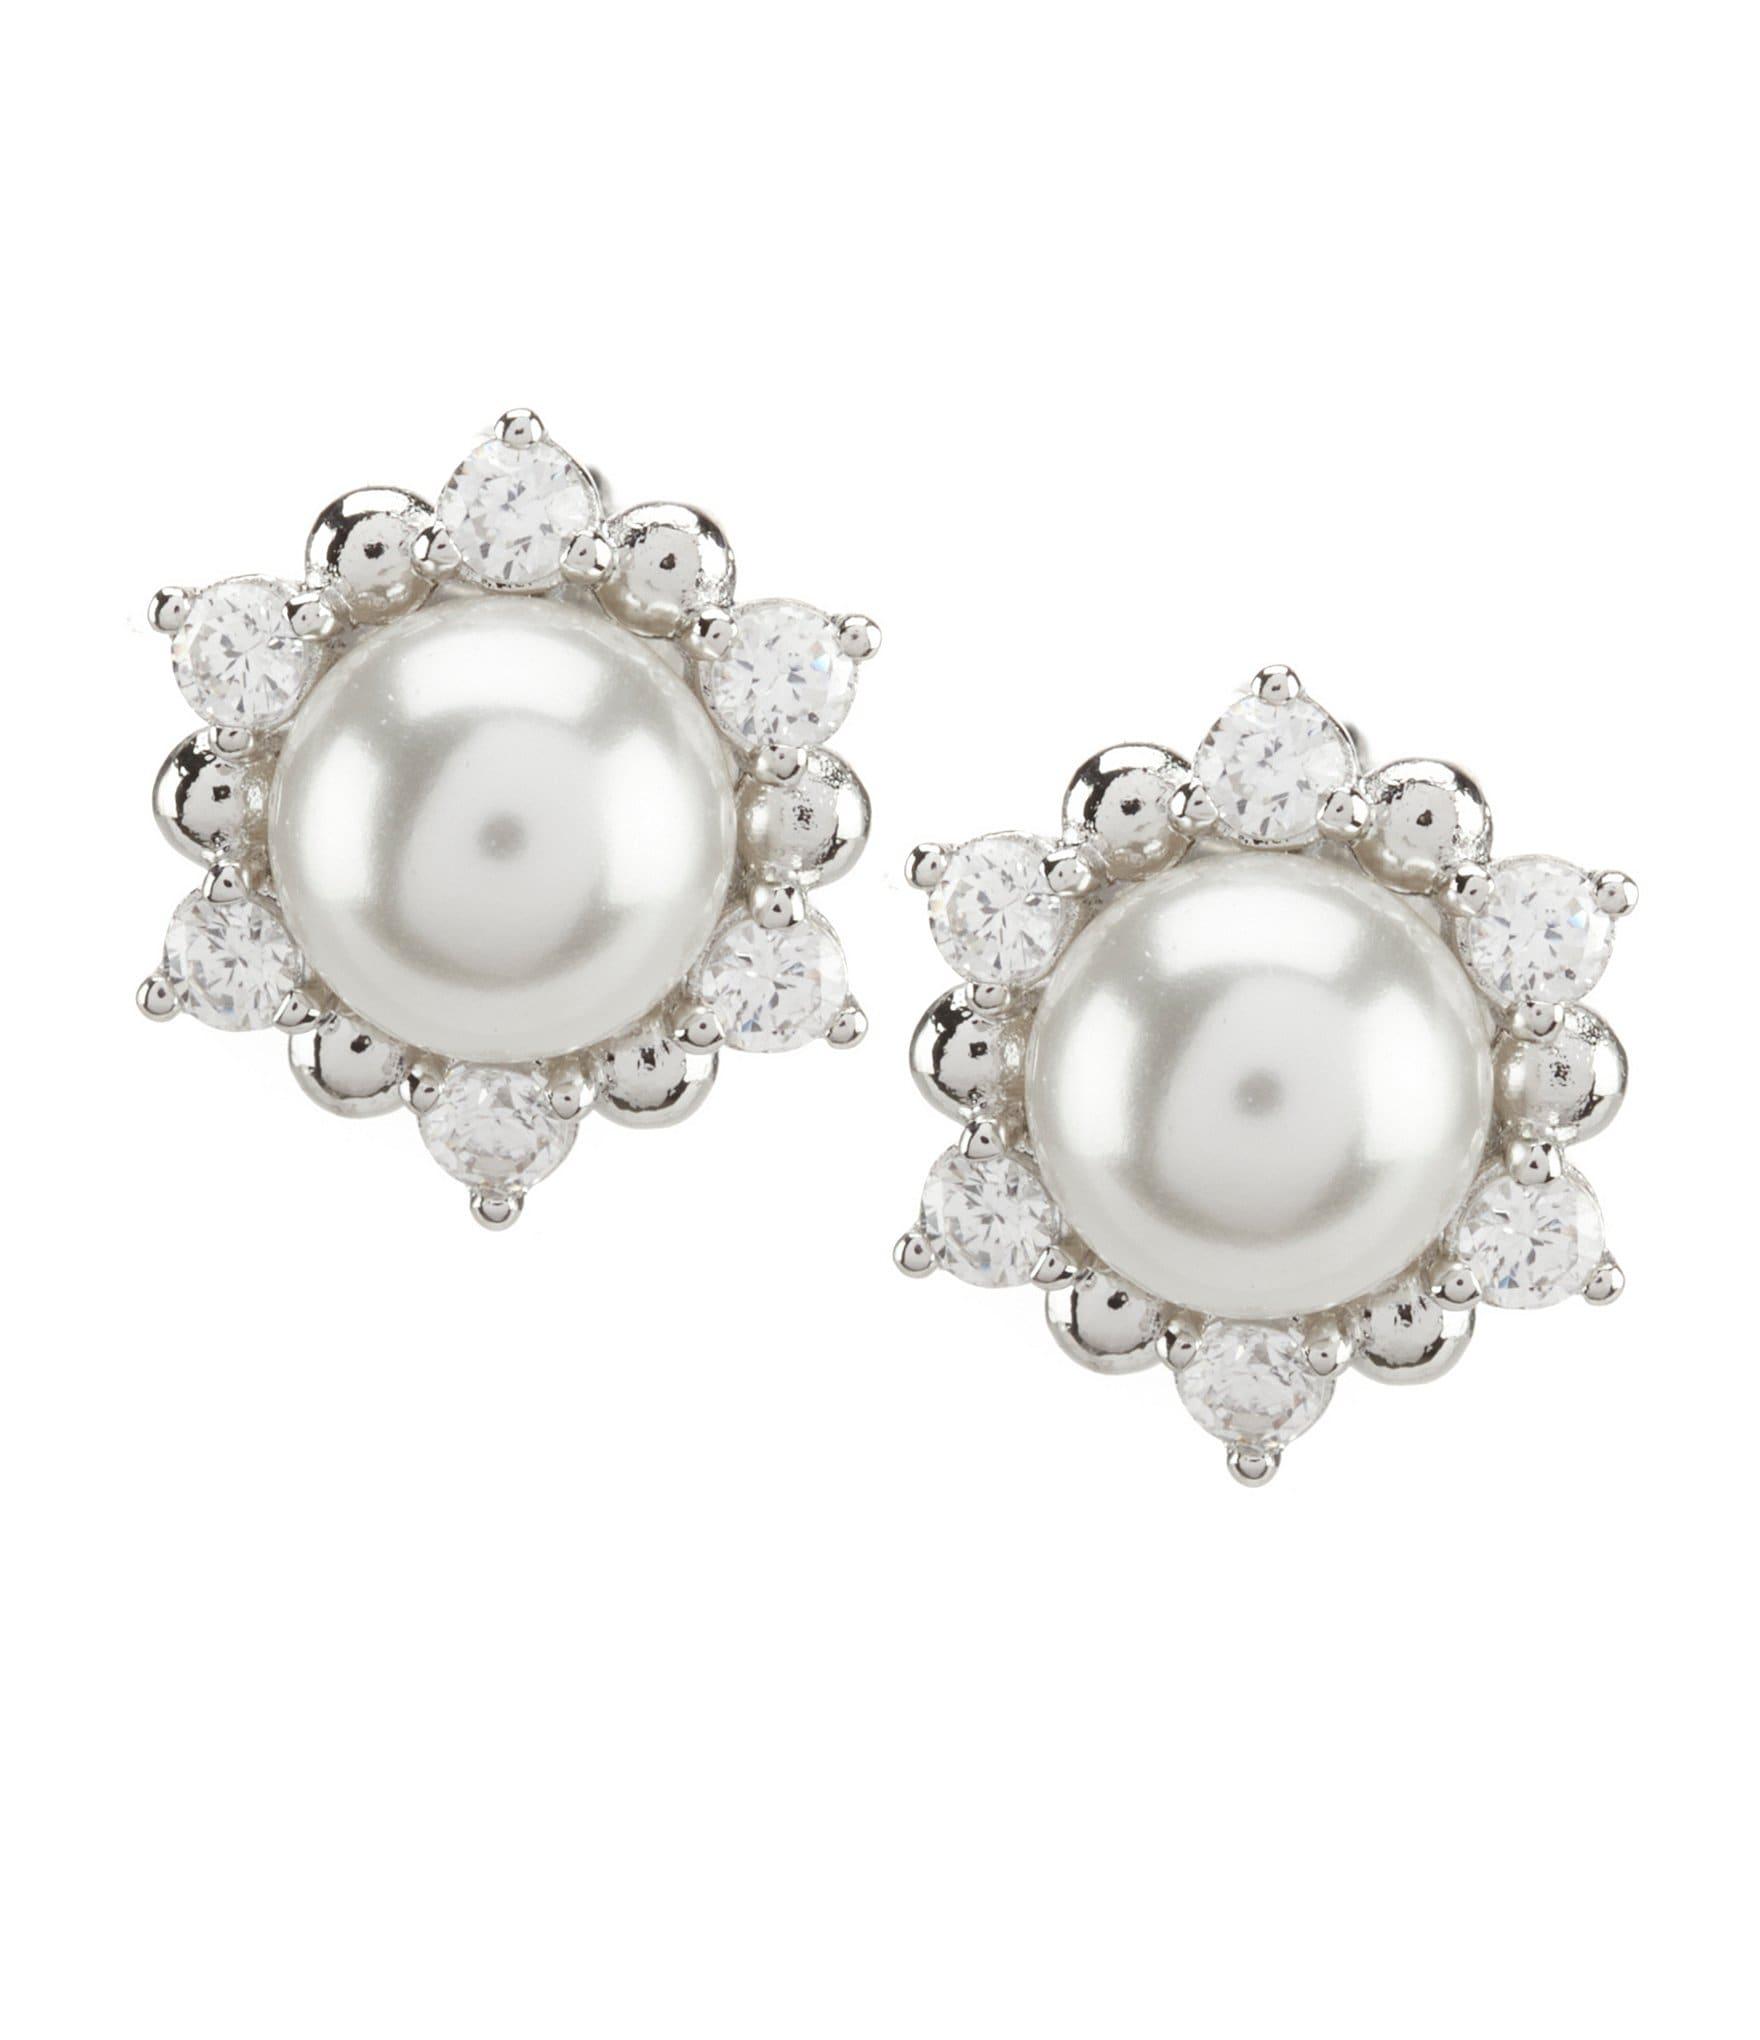 Accessories Jewelry Bridal Jewelry